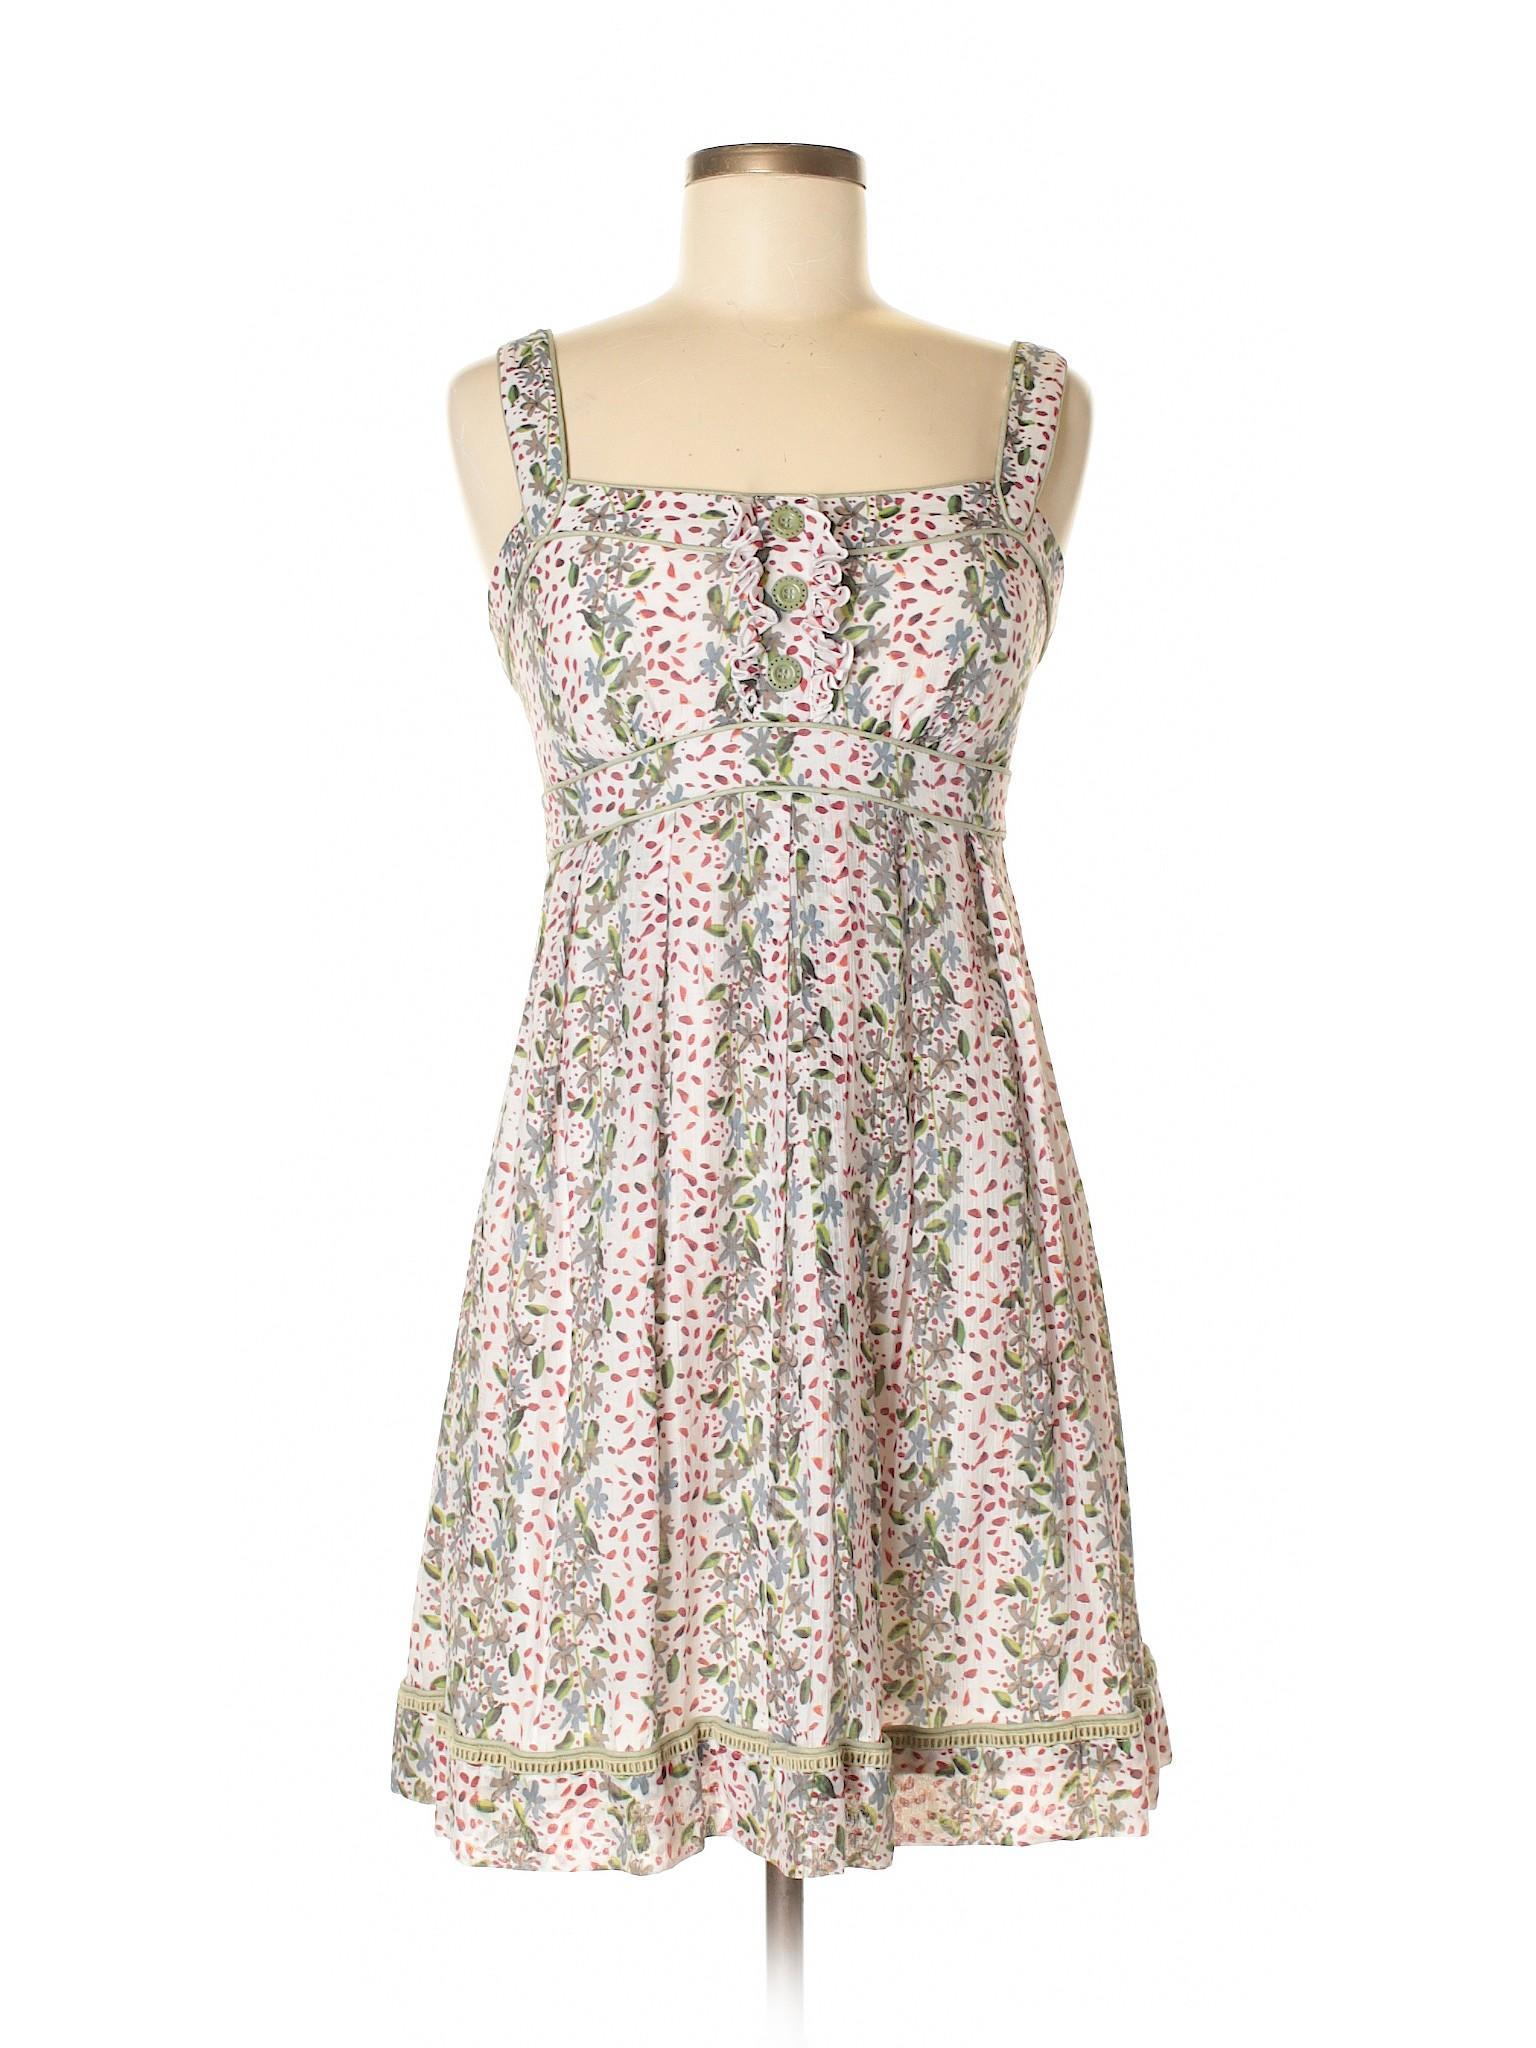 Jessica Simpson Simpson Jessica Selling Dress Selling Dress Casual Casual Selling WqnZx7Af